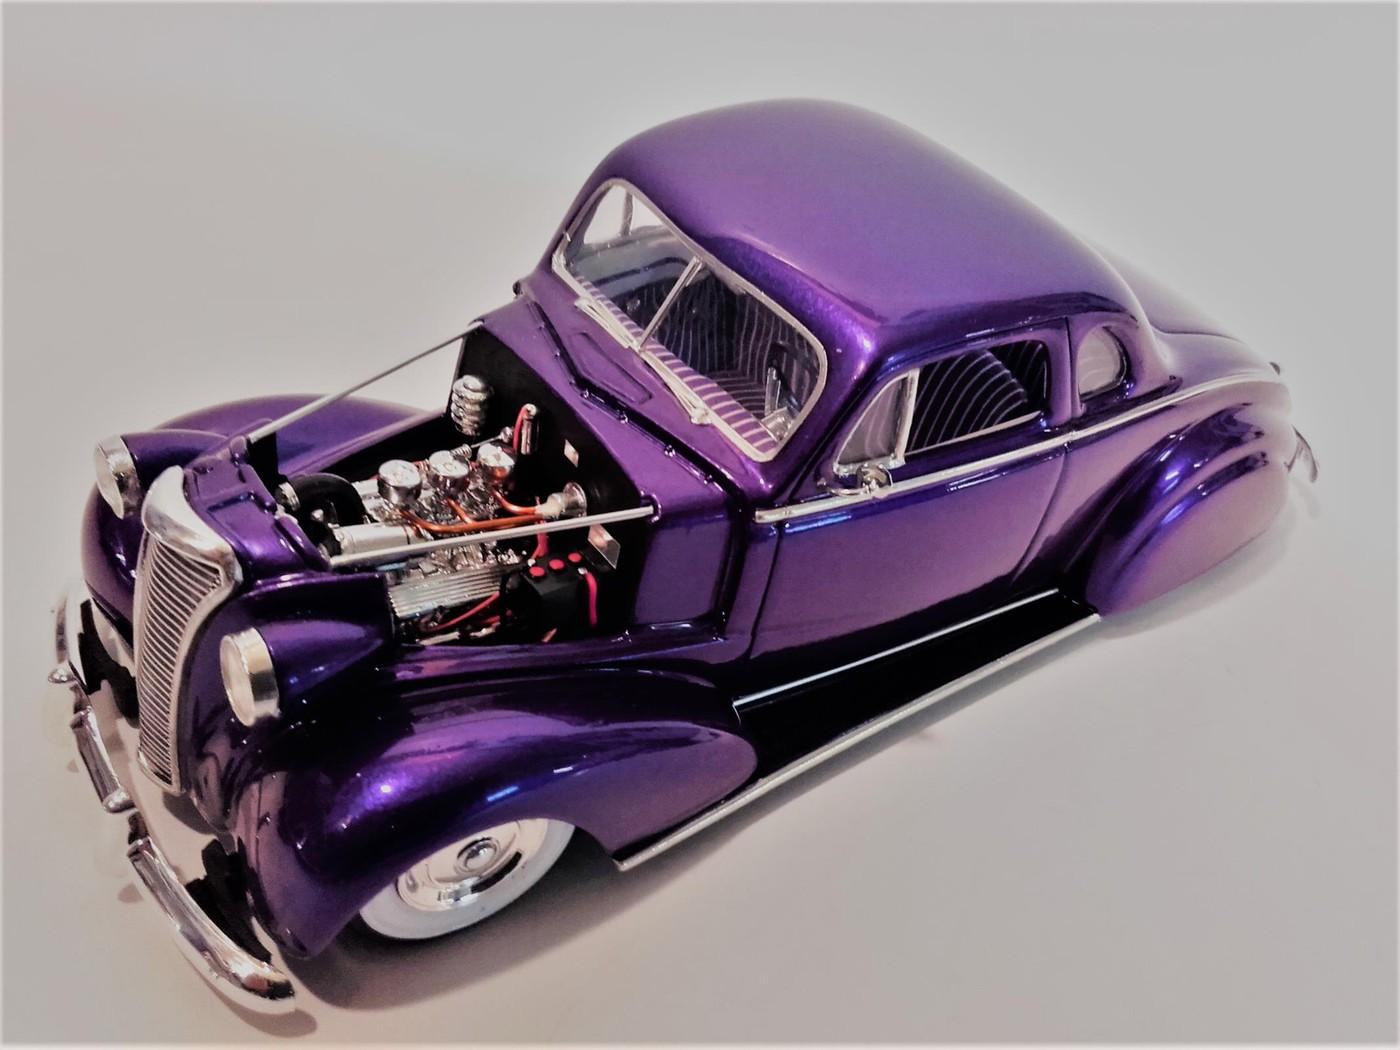 Projet Chevy 37 custom terminée  - Page 2 Photo26-vi